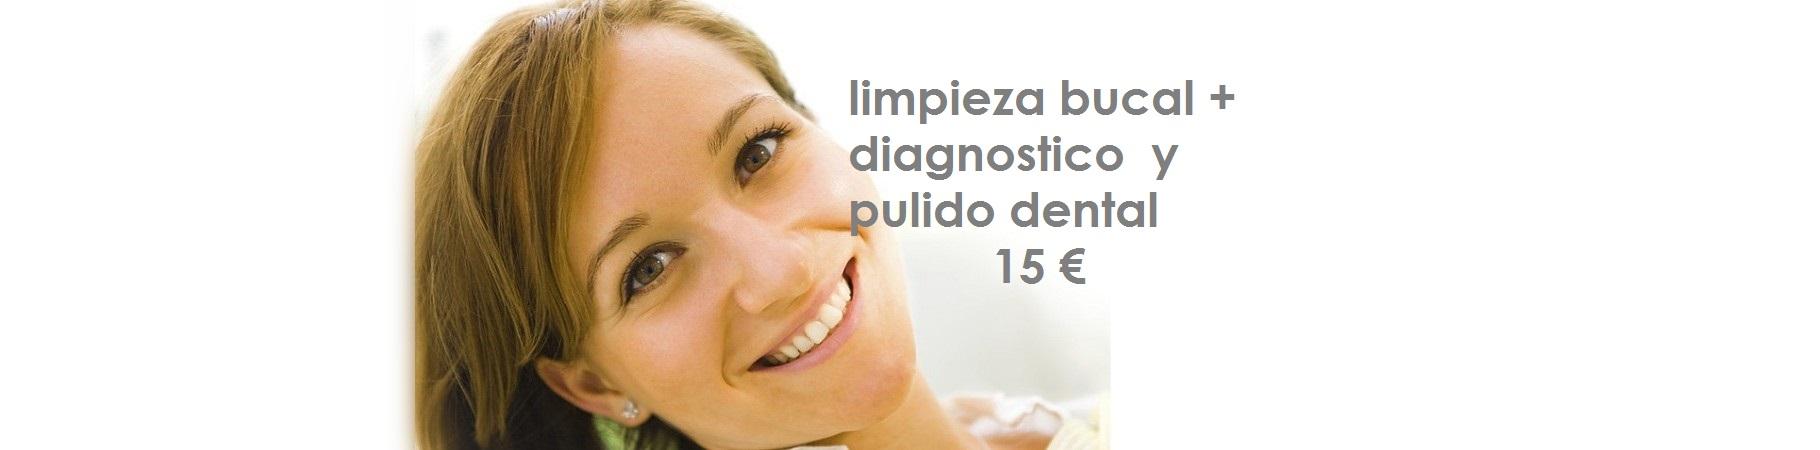 Dentista san Sebastián de los reyes, dentista sanse